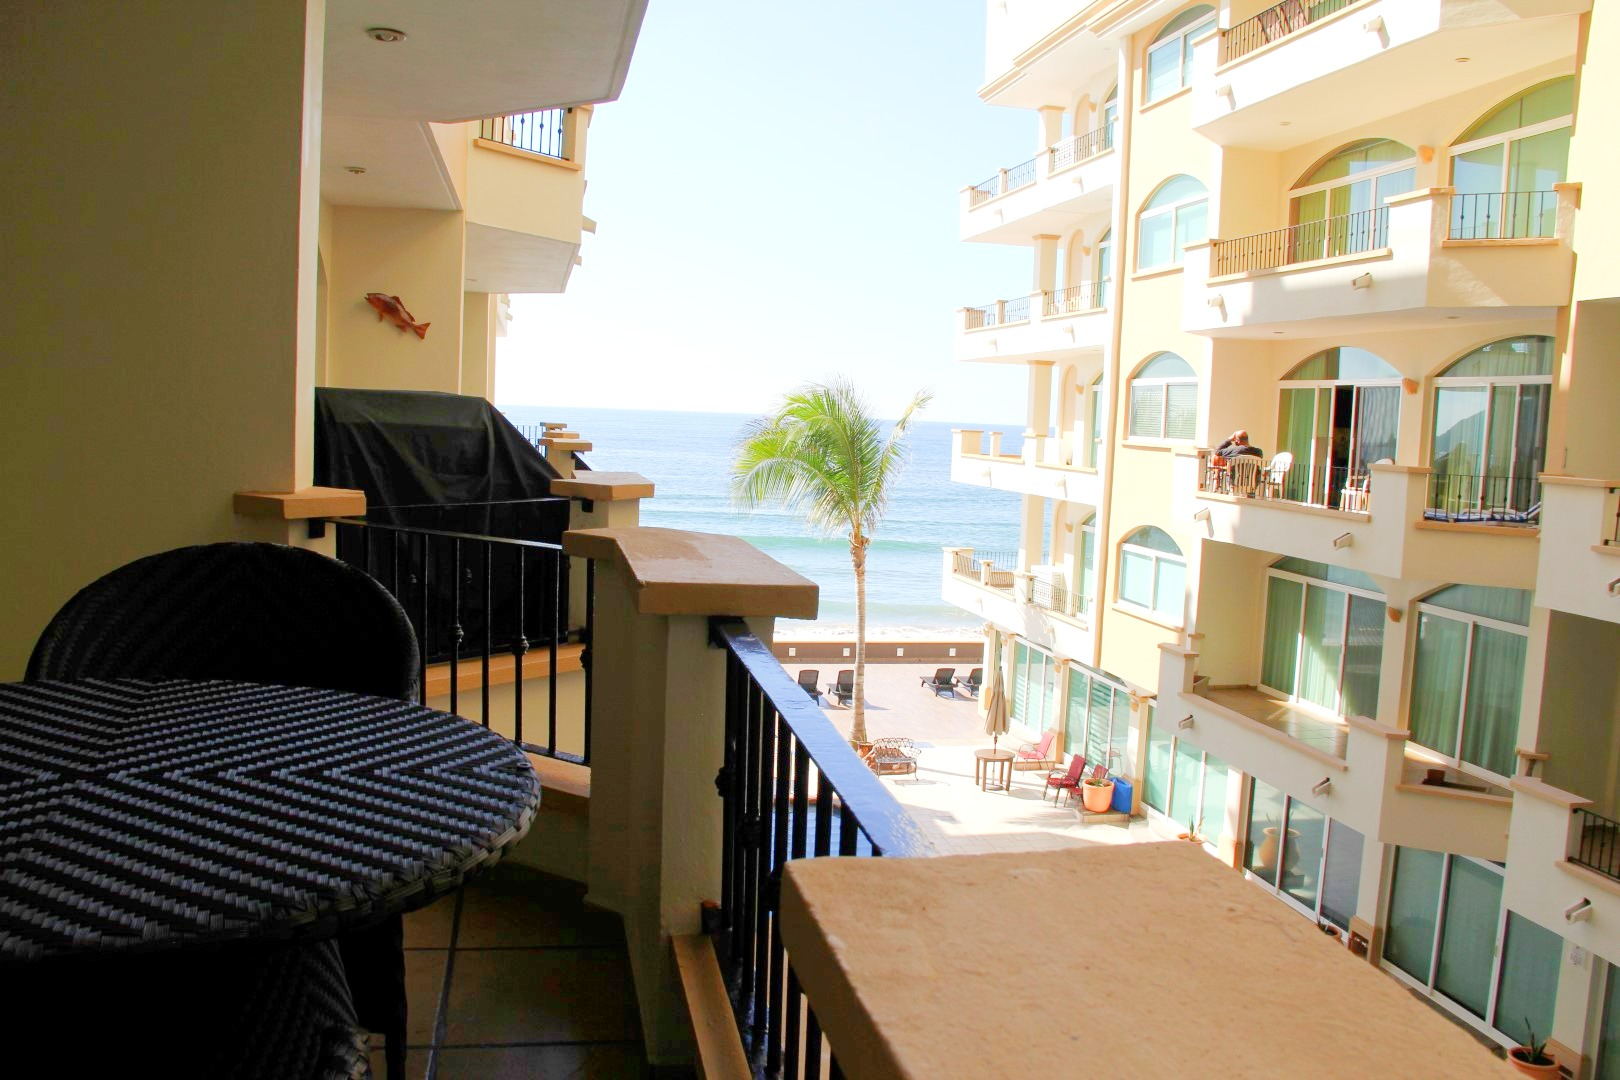 Patio with ocean views.